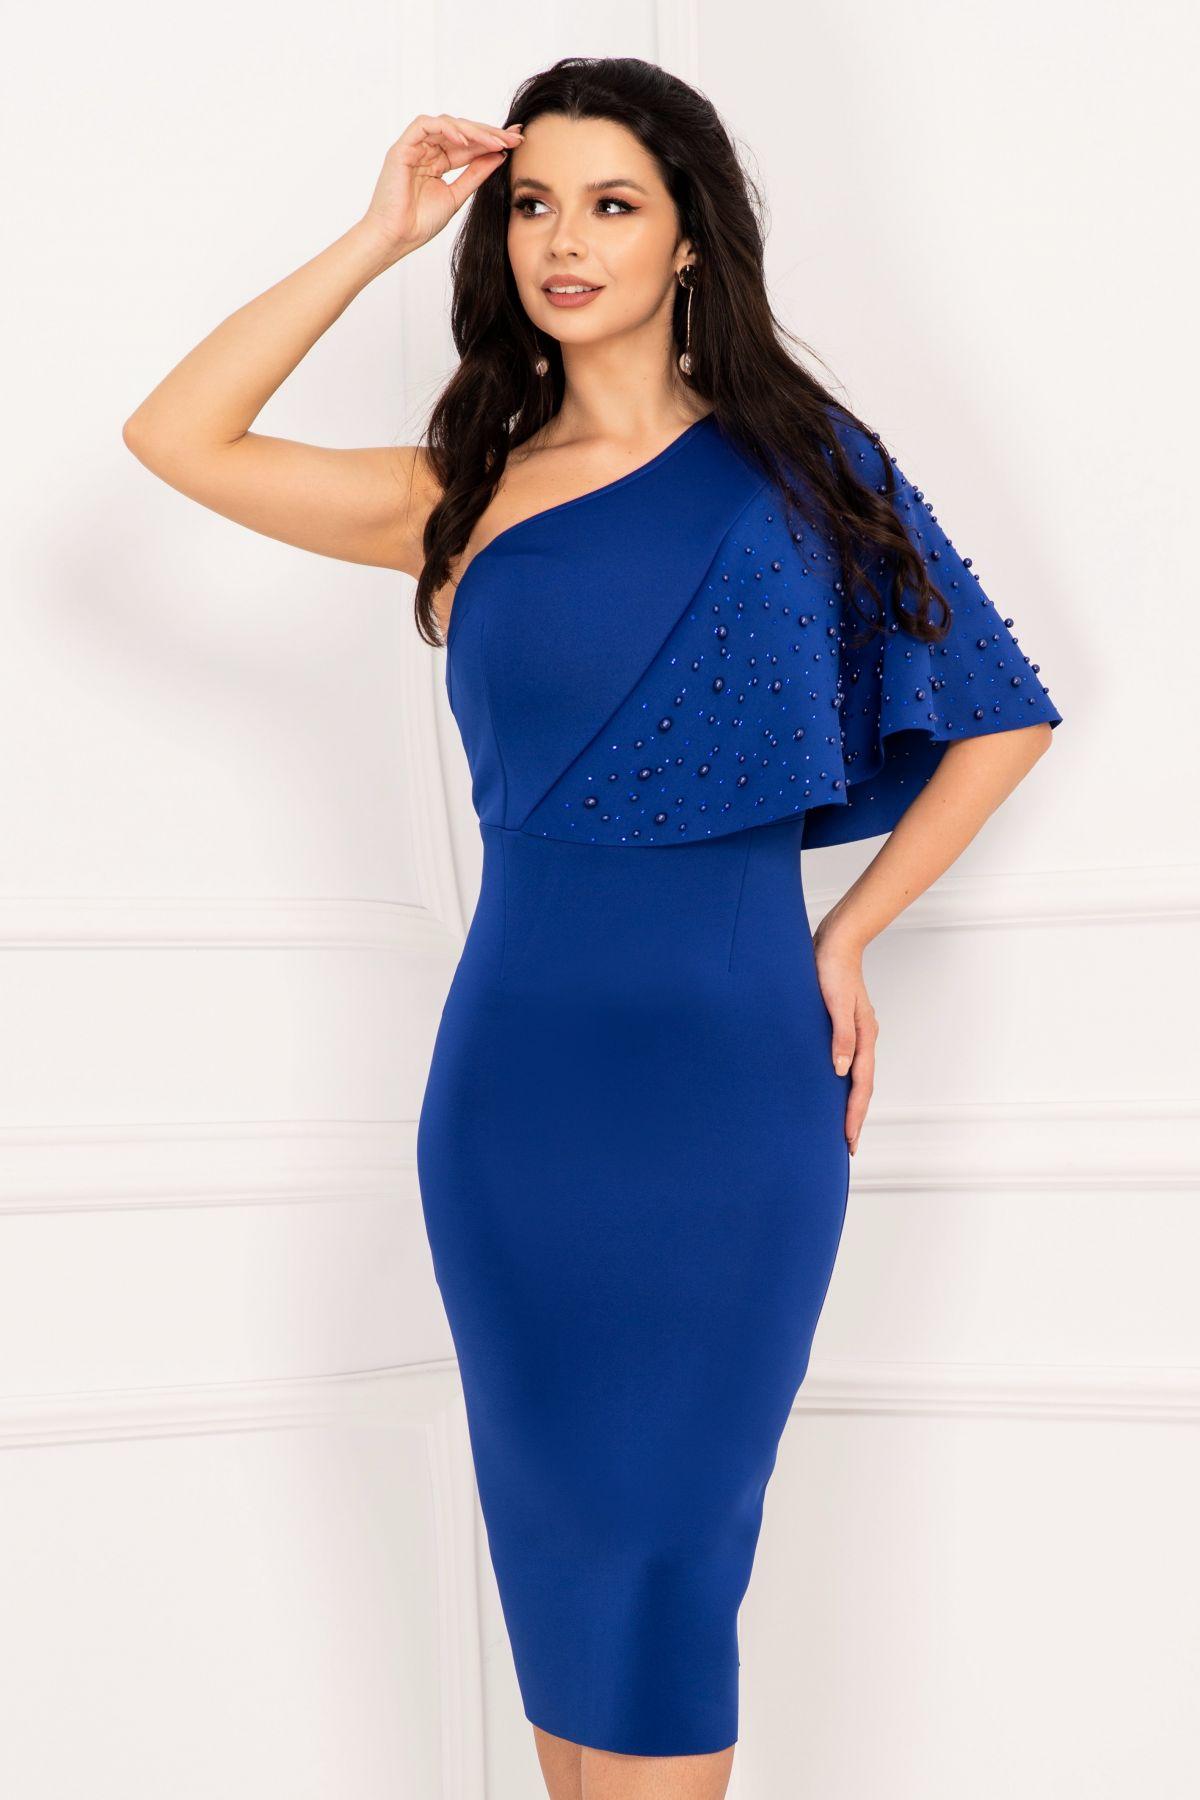 Rochie de ocazie albastra eleganta cu perle si strasuri aplicate